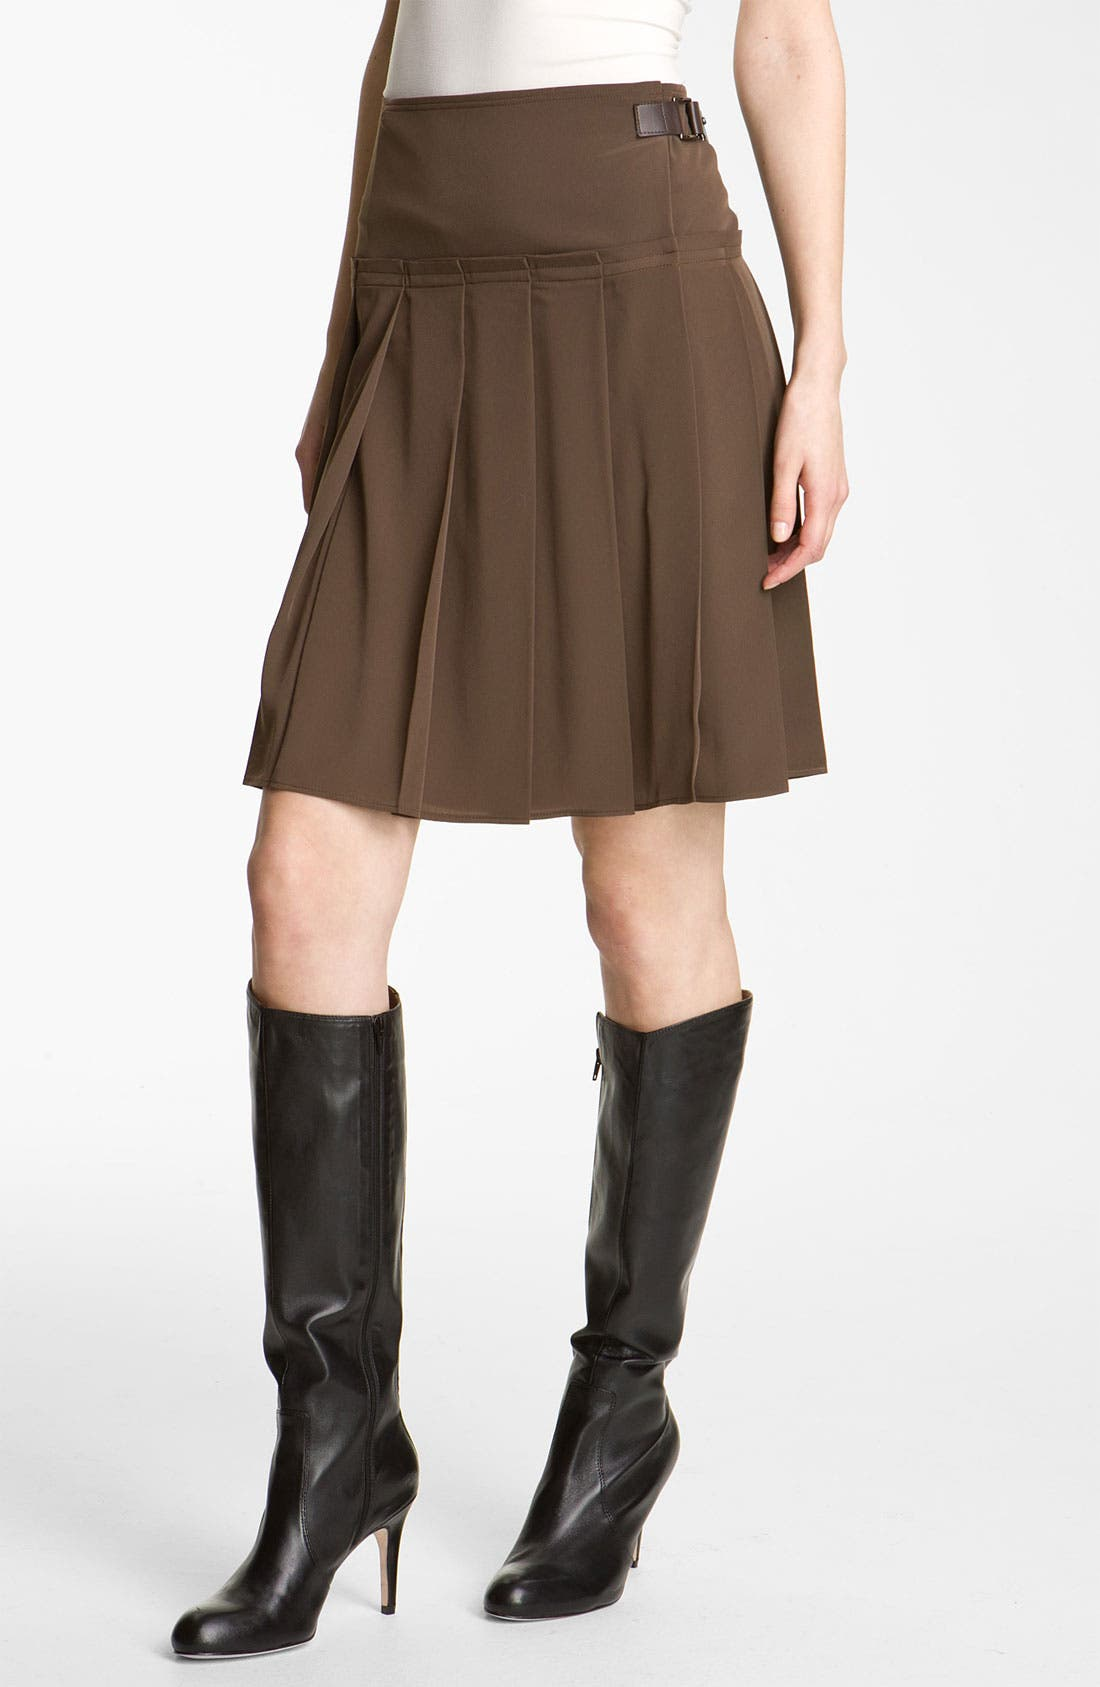 Alternate Image 1 Selected - Weekend Max Mara 'Rivera' Wrap Skirt